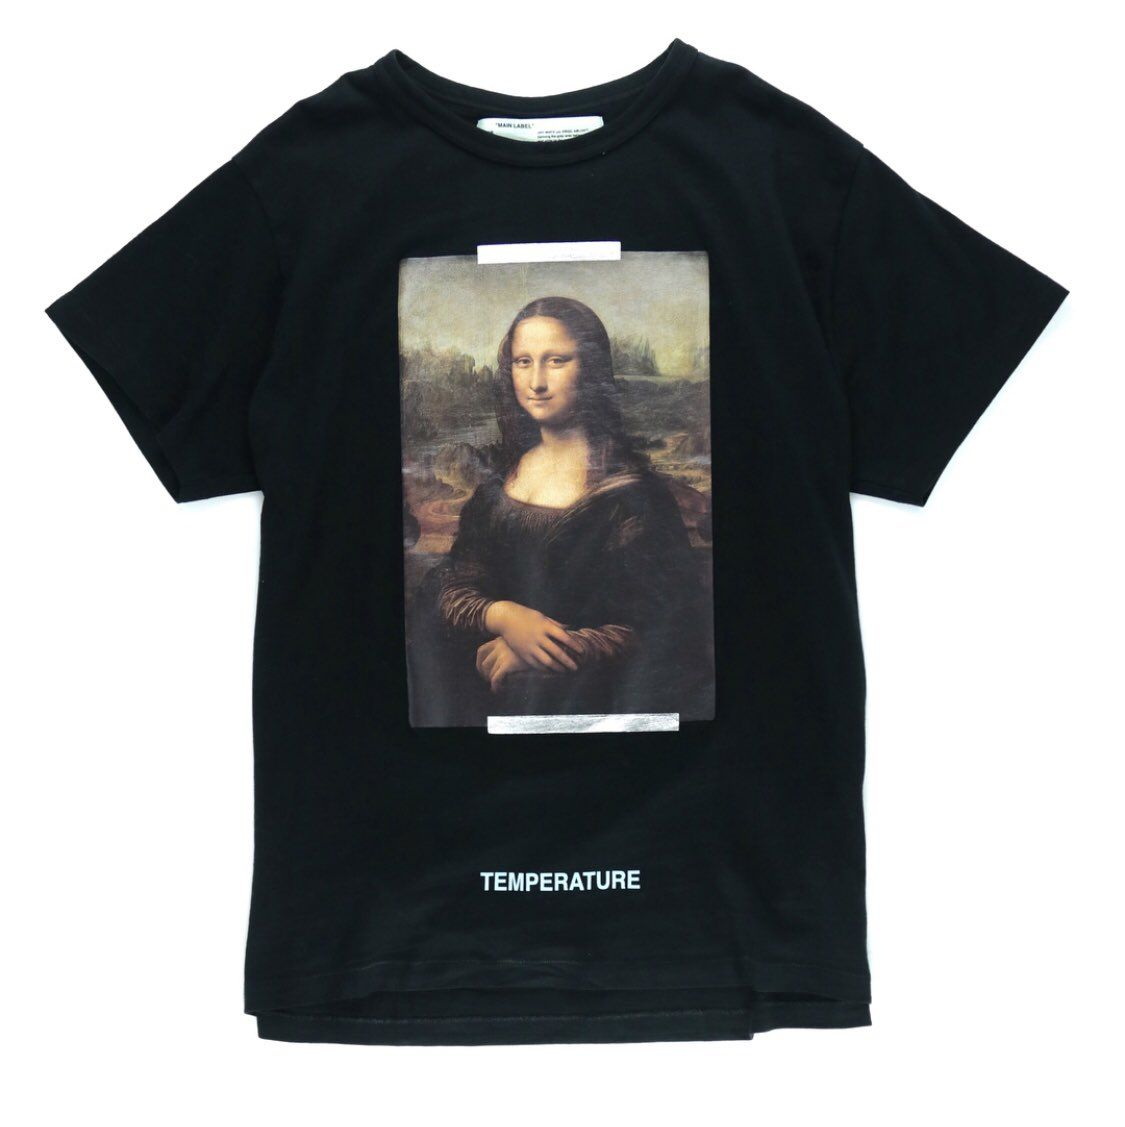 Off White X Mona Lisa Clothes Design Shirt Designs Shirts [ 1127 x 1125 Pixel ]